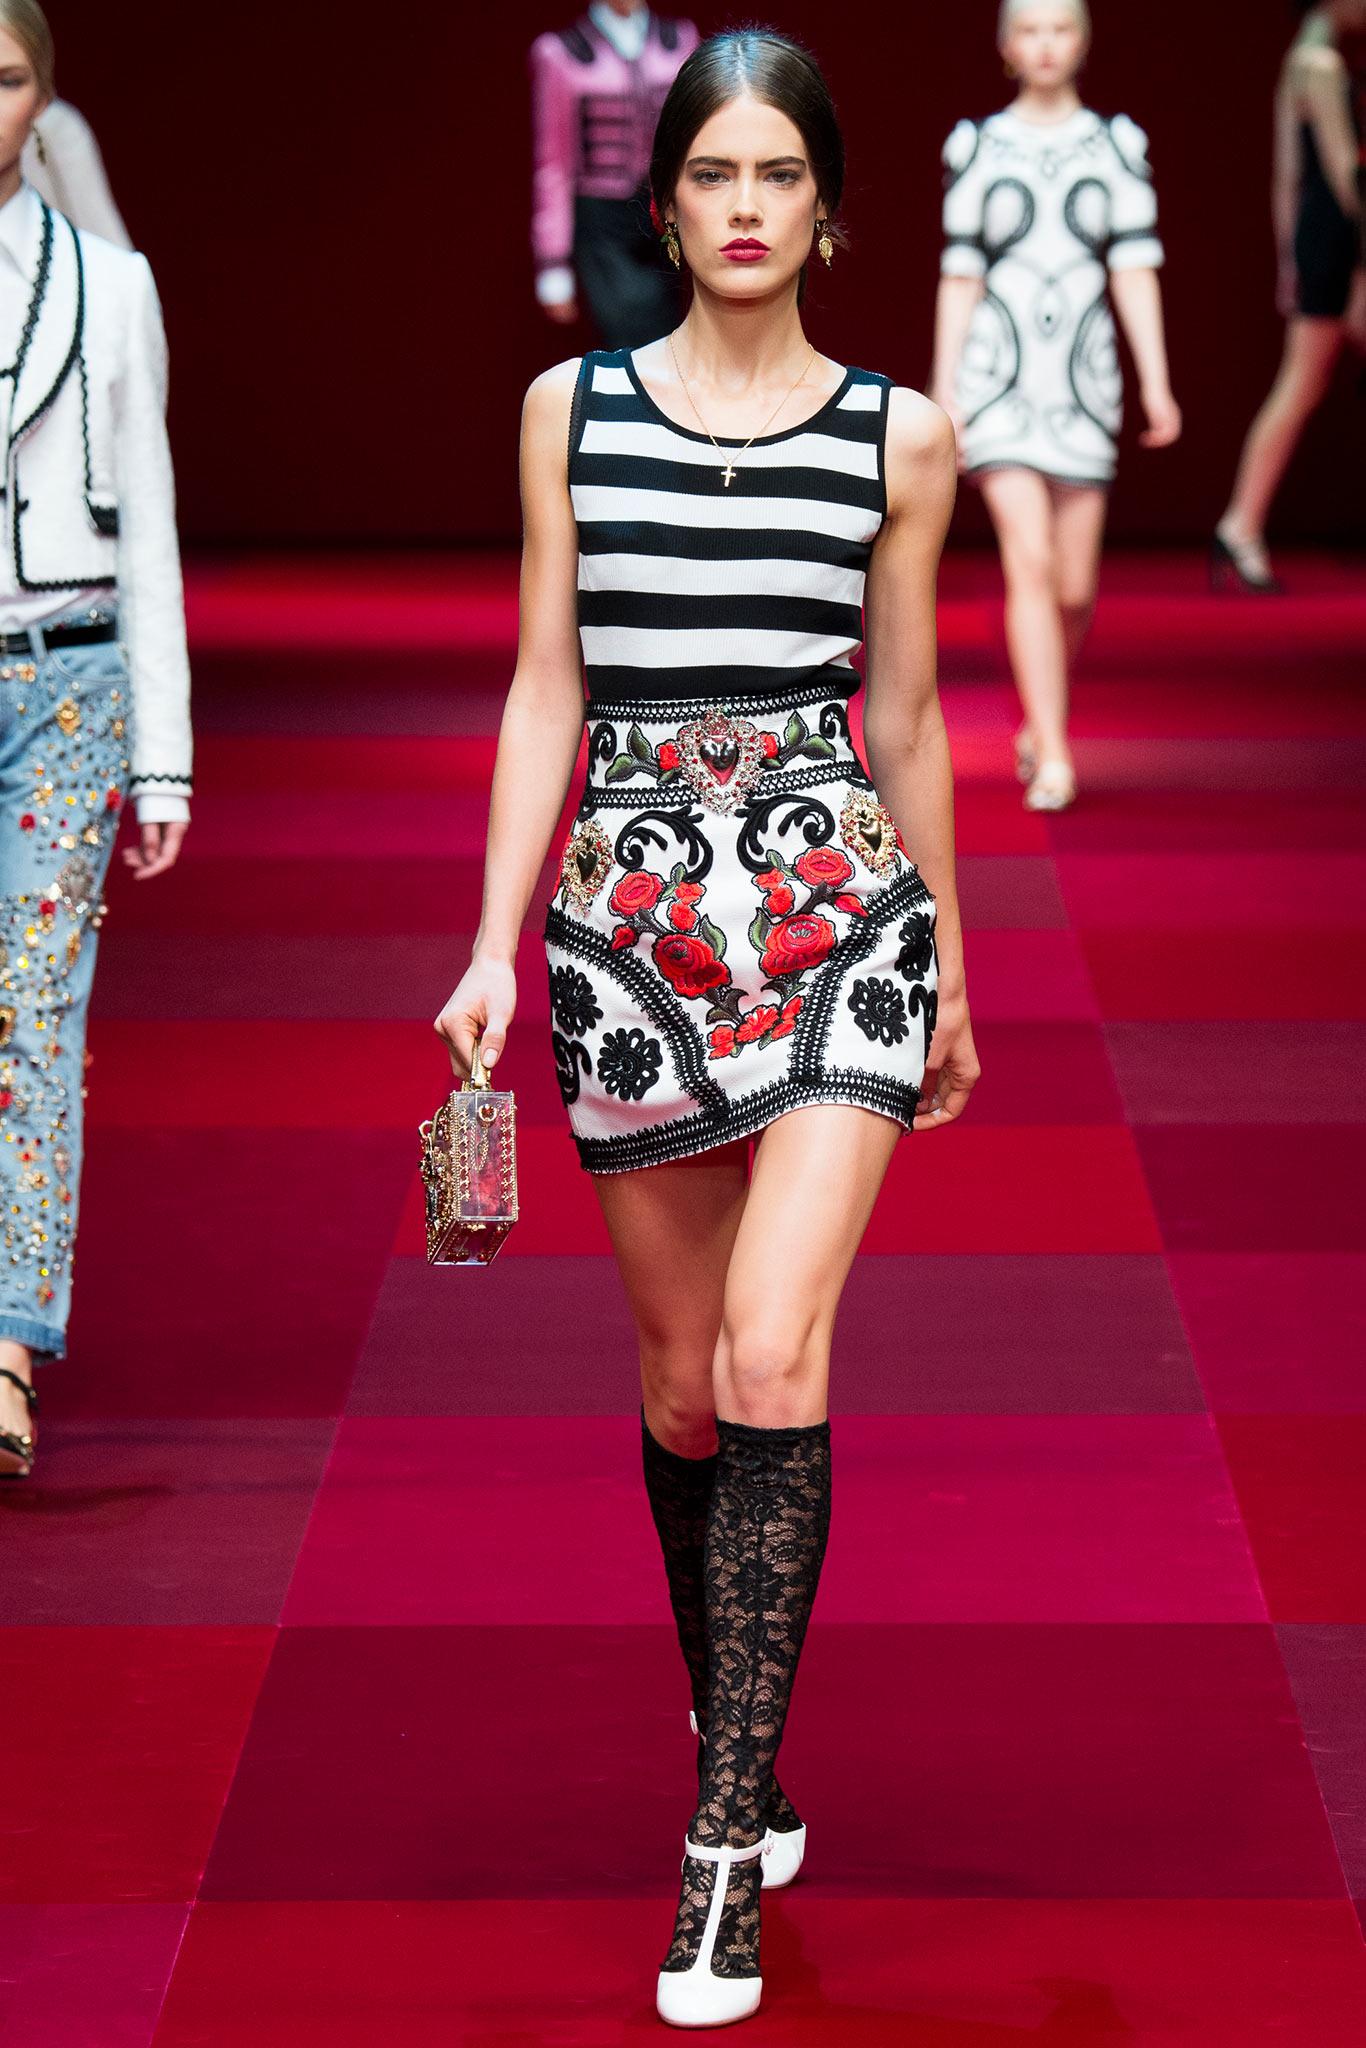 Spanish Fashion: Ladies Edition - Young Adventuress 34